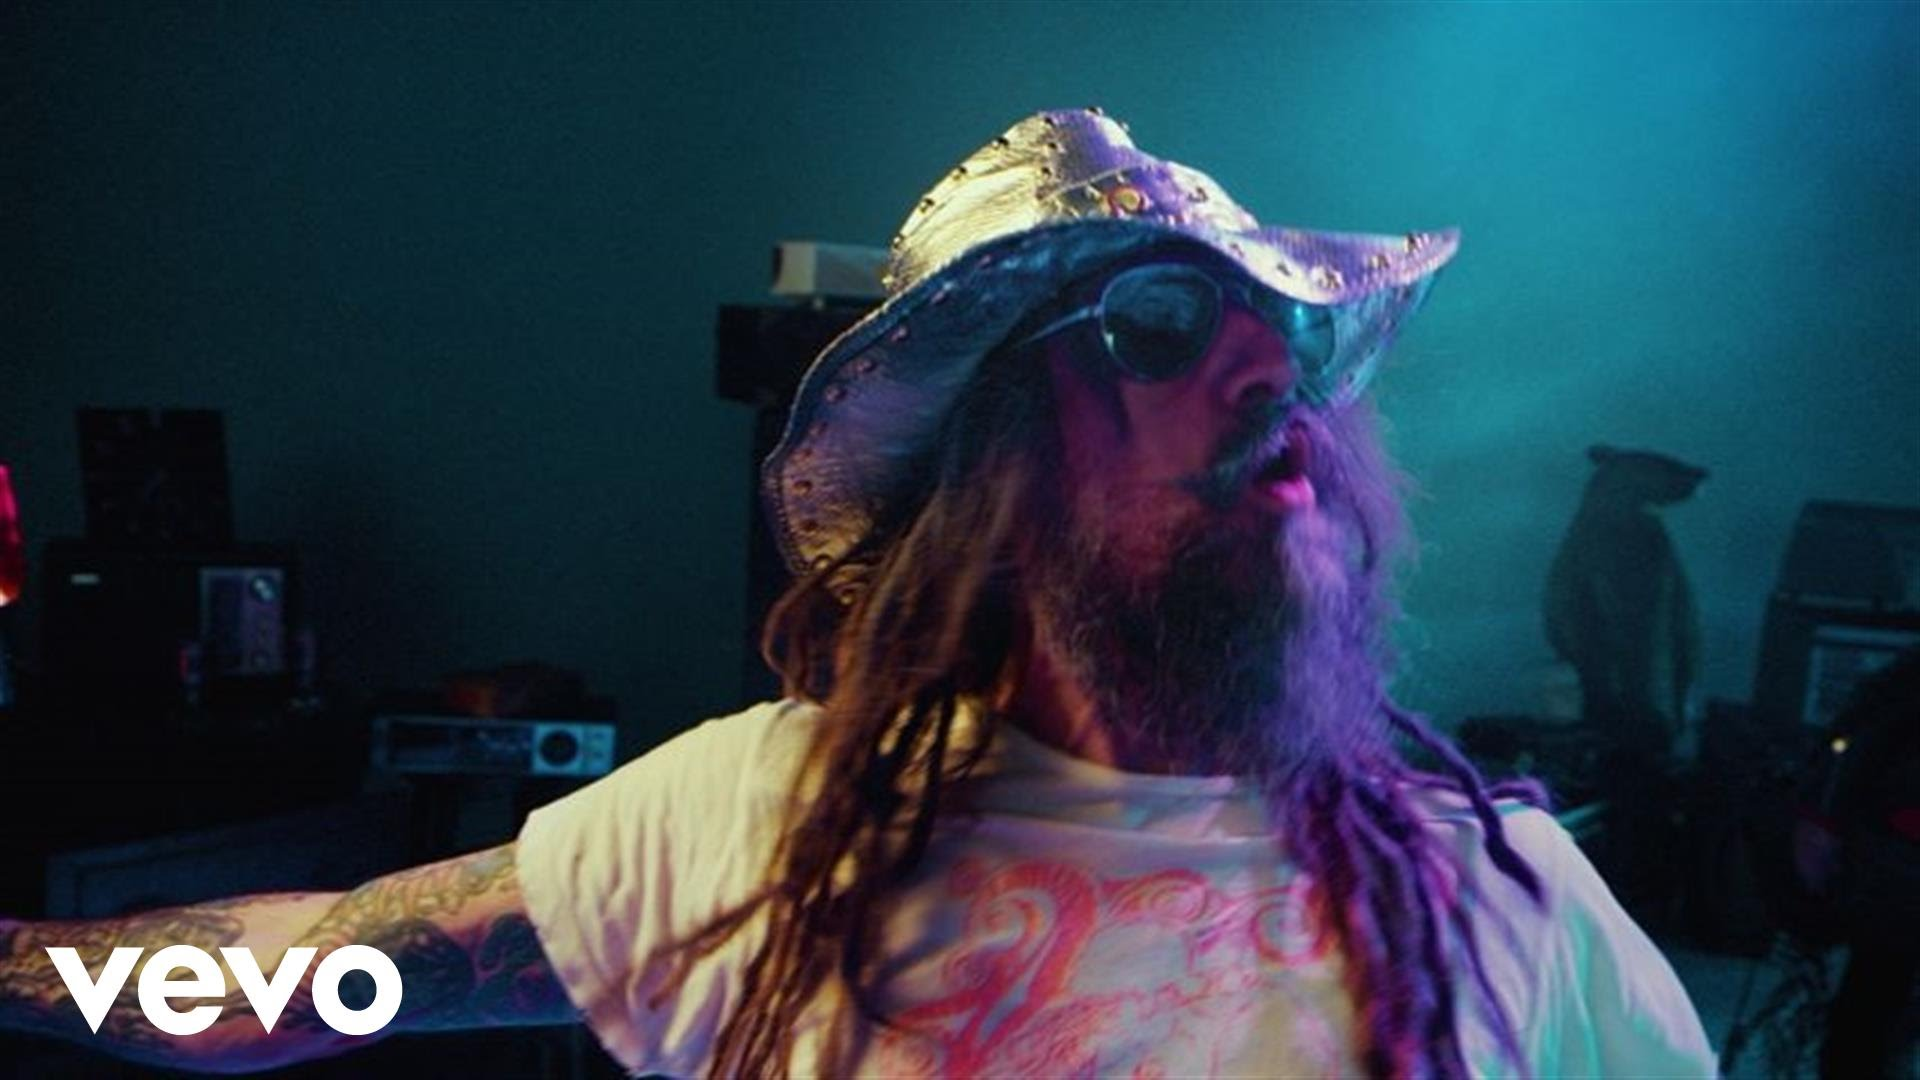 Rob Zombie reveals plans for 'Astro-Creep: 2000' live album